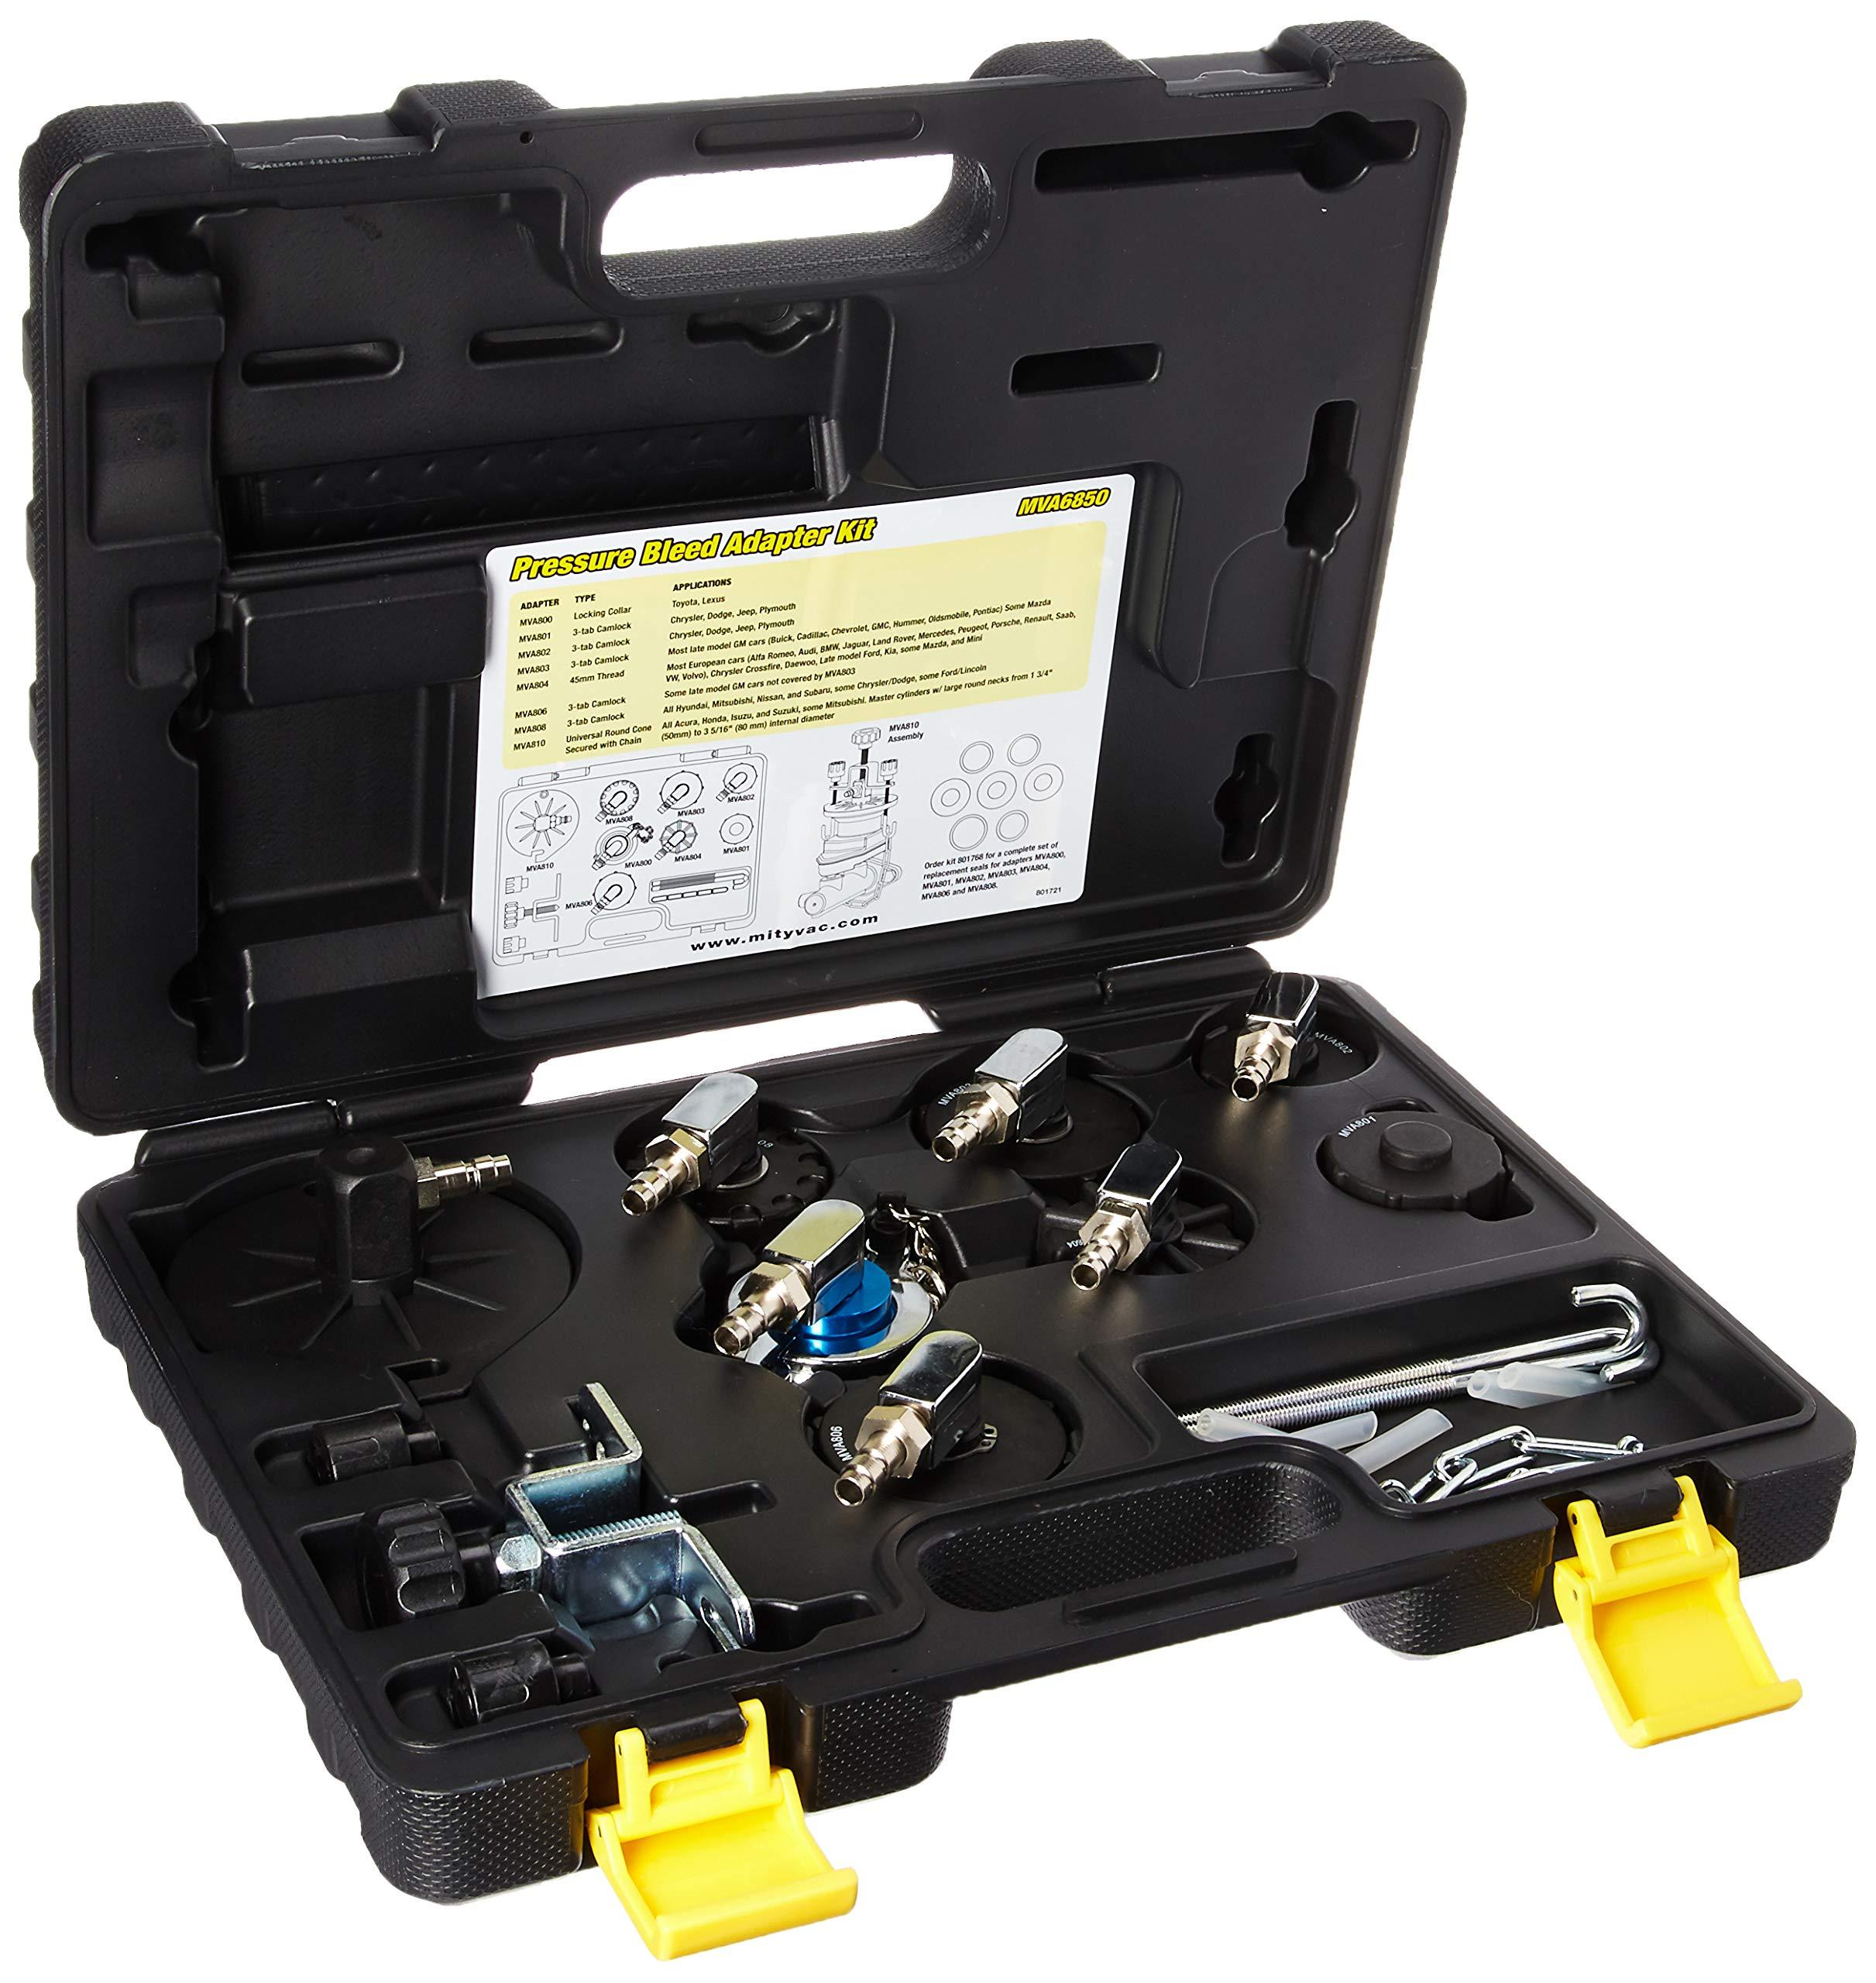 Mityvac MVA6850 Pressure Bleed Adapter kit by Mityvac (Image #3)